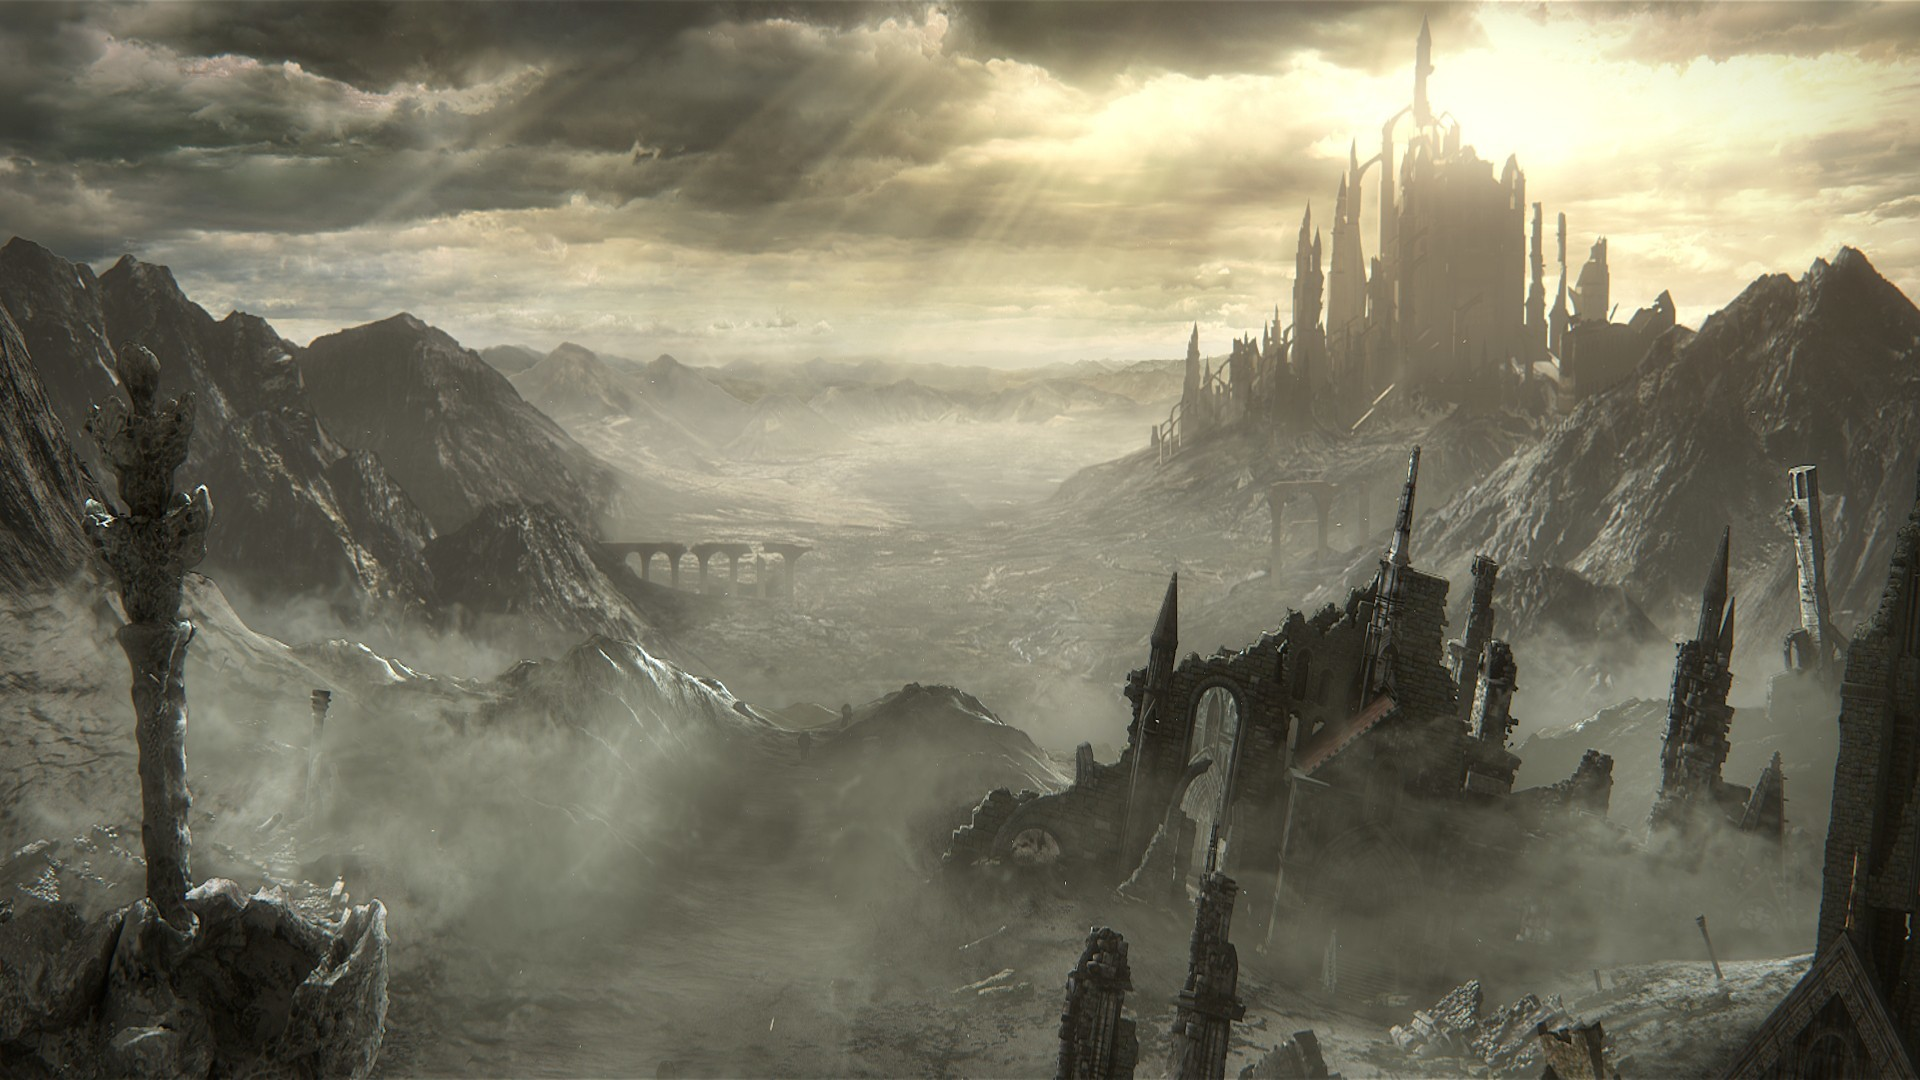 General Dark Souls III Dark Souls Gothic midevil dark video games  knight fire fighting sword